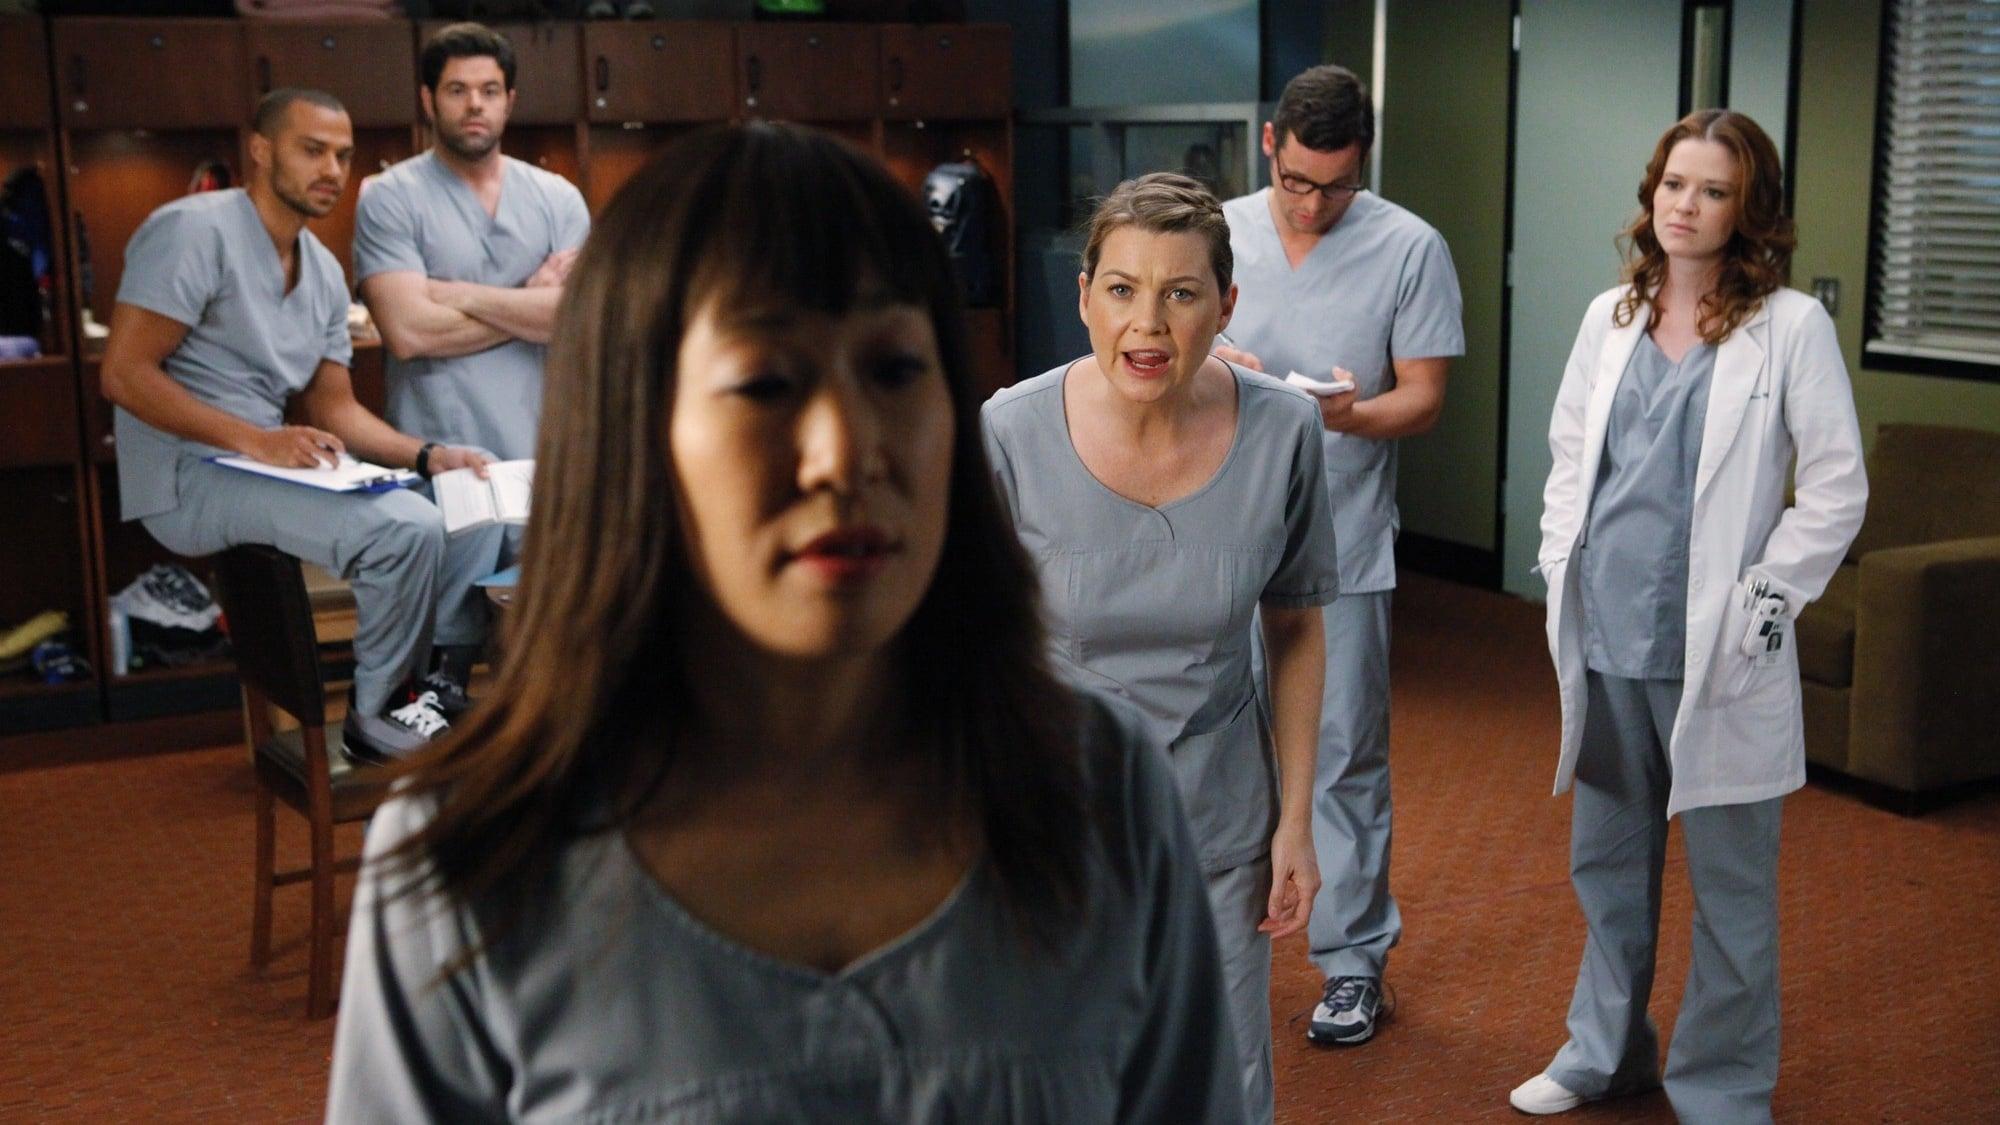 Watch Greys Anatomy 8x13 Episode Online For Free Movie4u